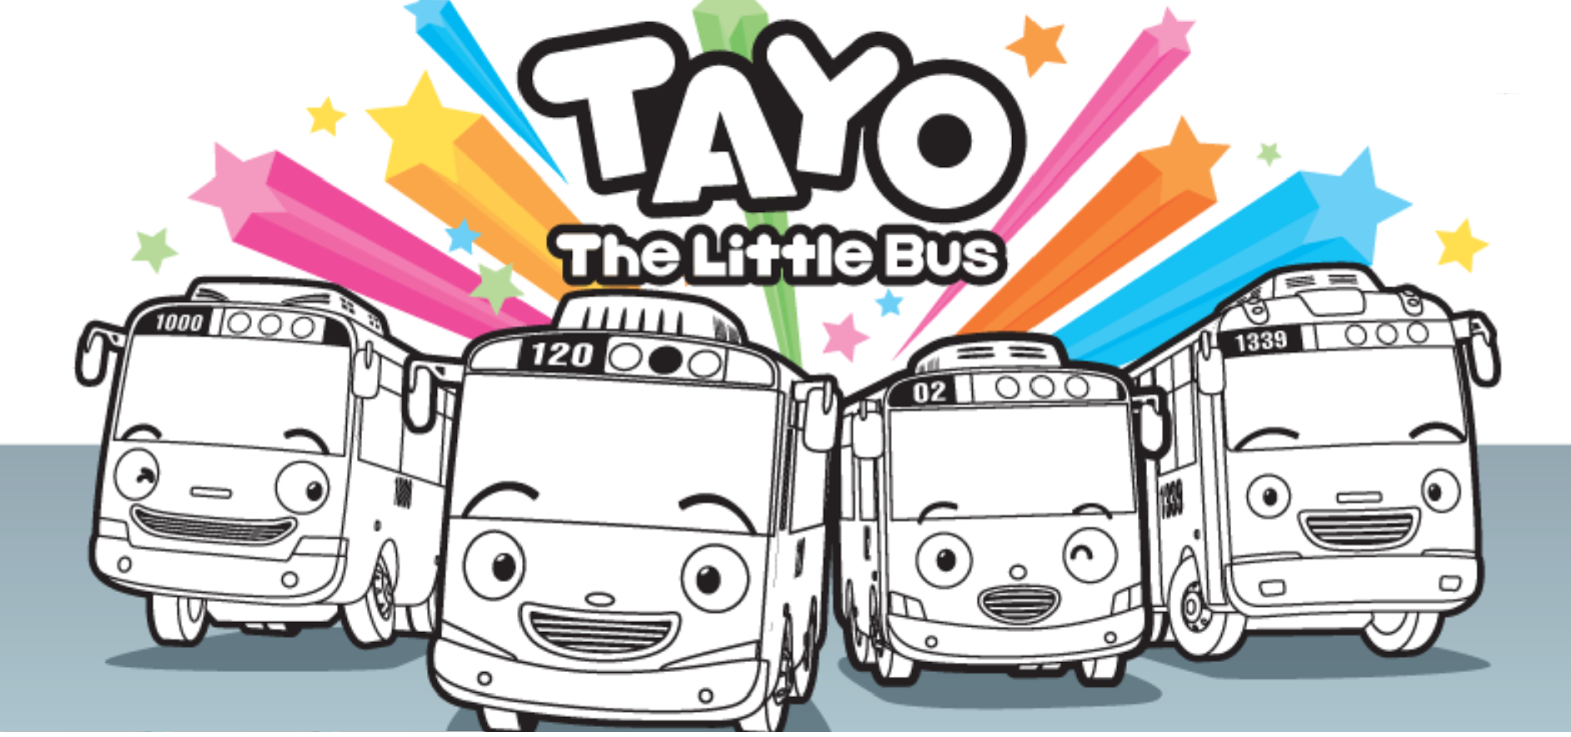 Gambar Mewarnai Tayo The Little Bus Bis Kecil Yang Baik Hati